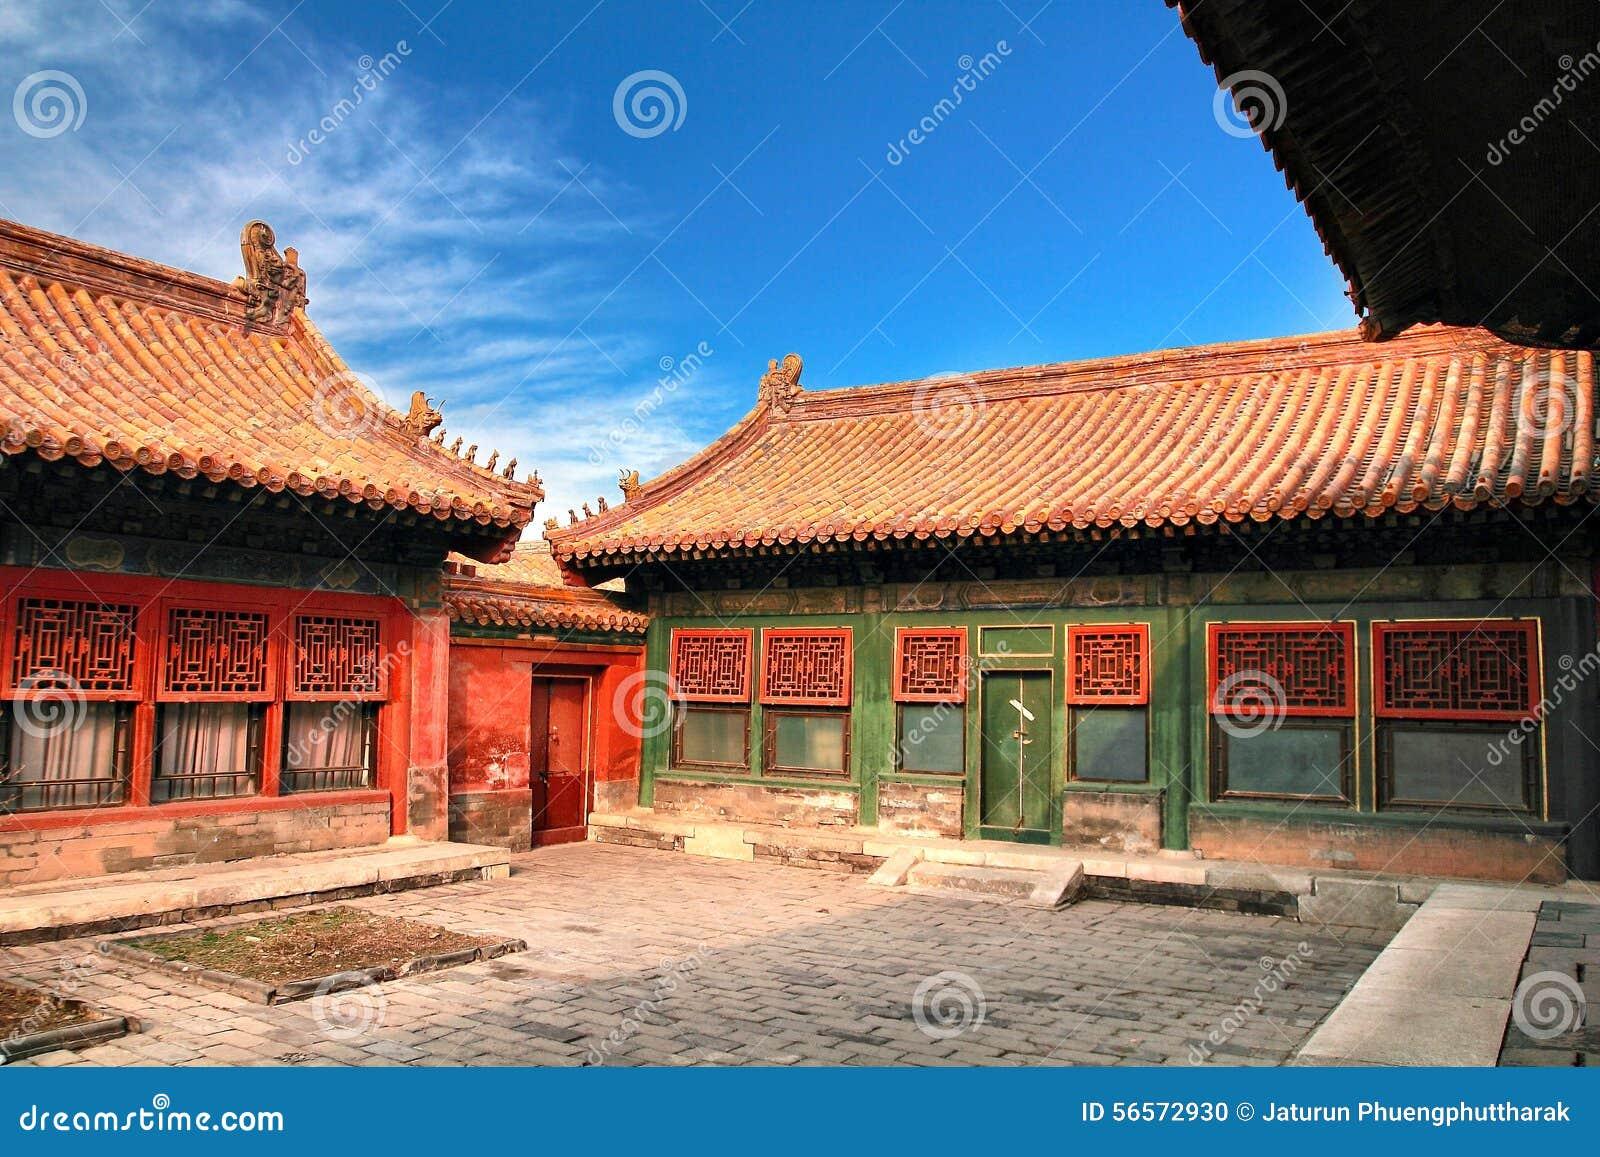 Download Η απαγορευμένη πόλη στο Πεκίνο, Κίνα Στοκ Εικόνες - εικόνα από έλξη, ουρανός: 56572930